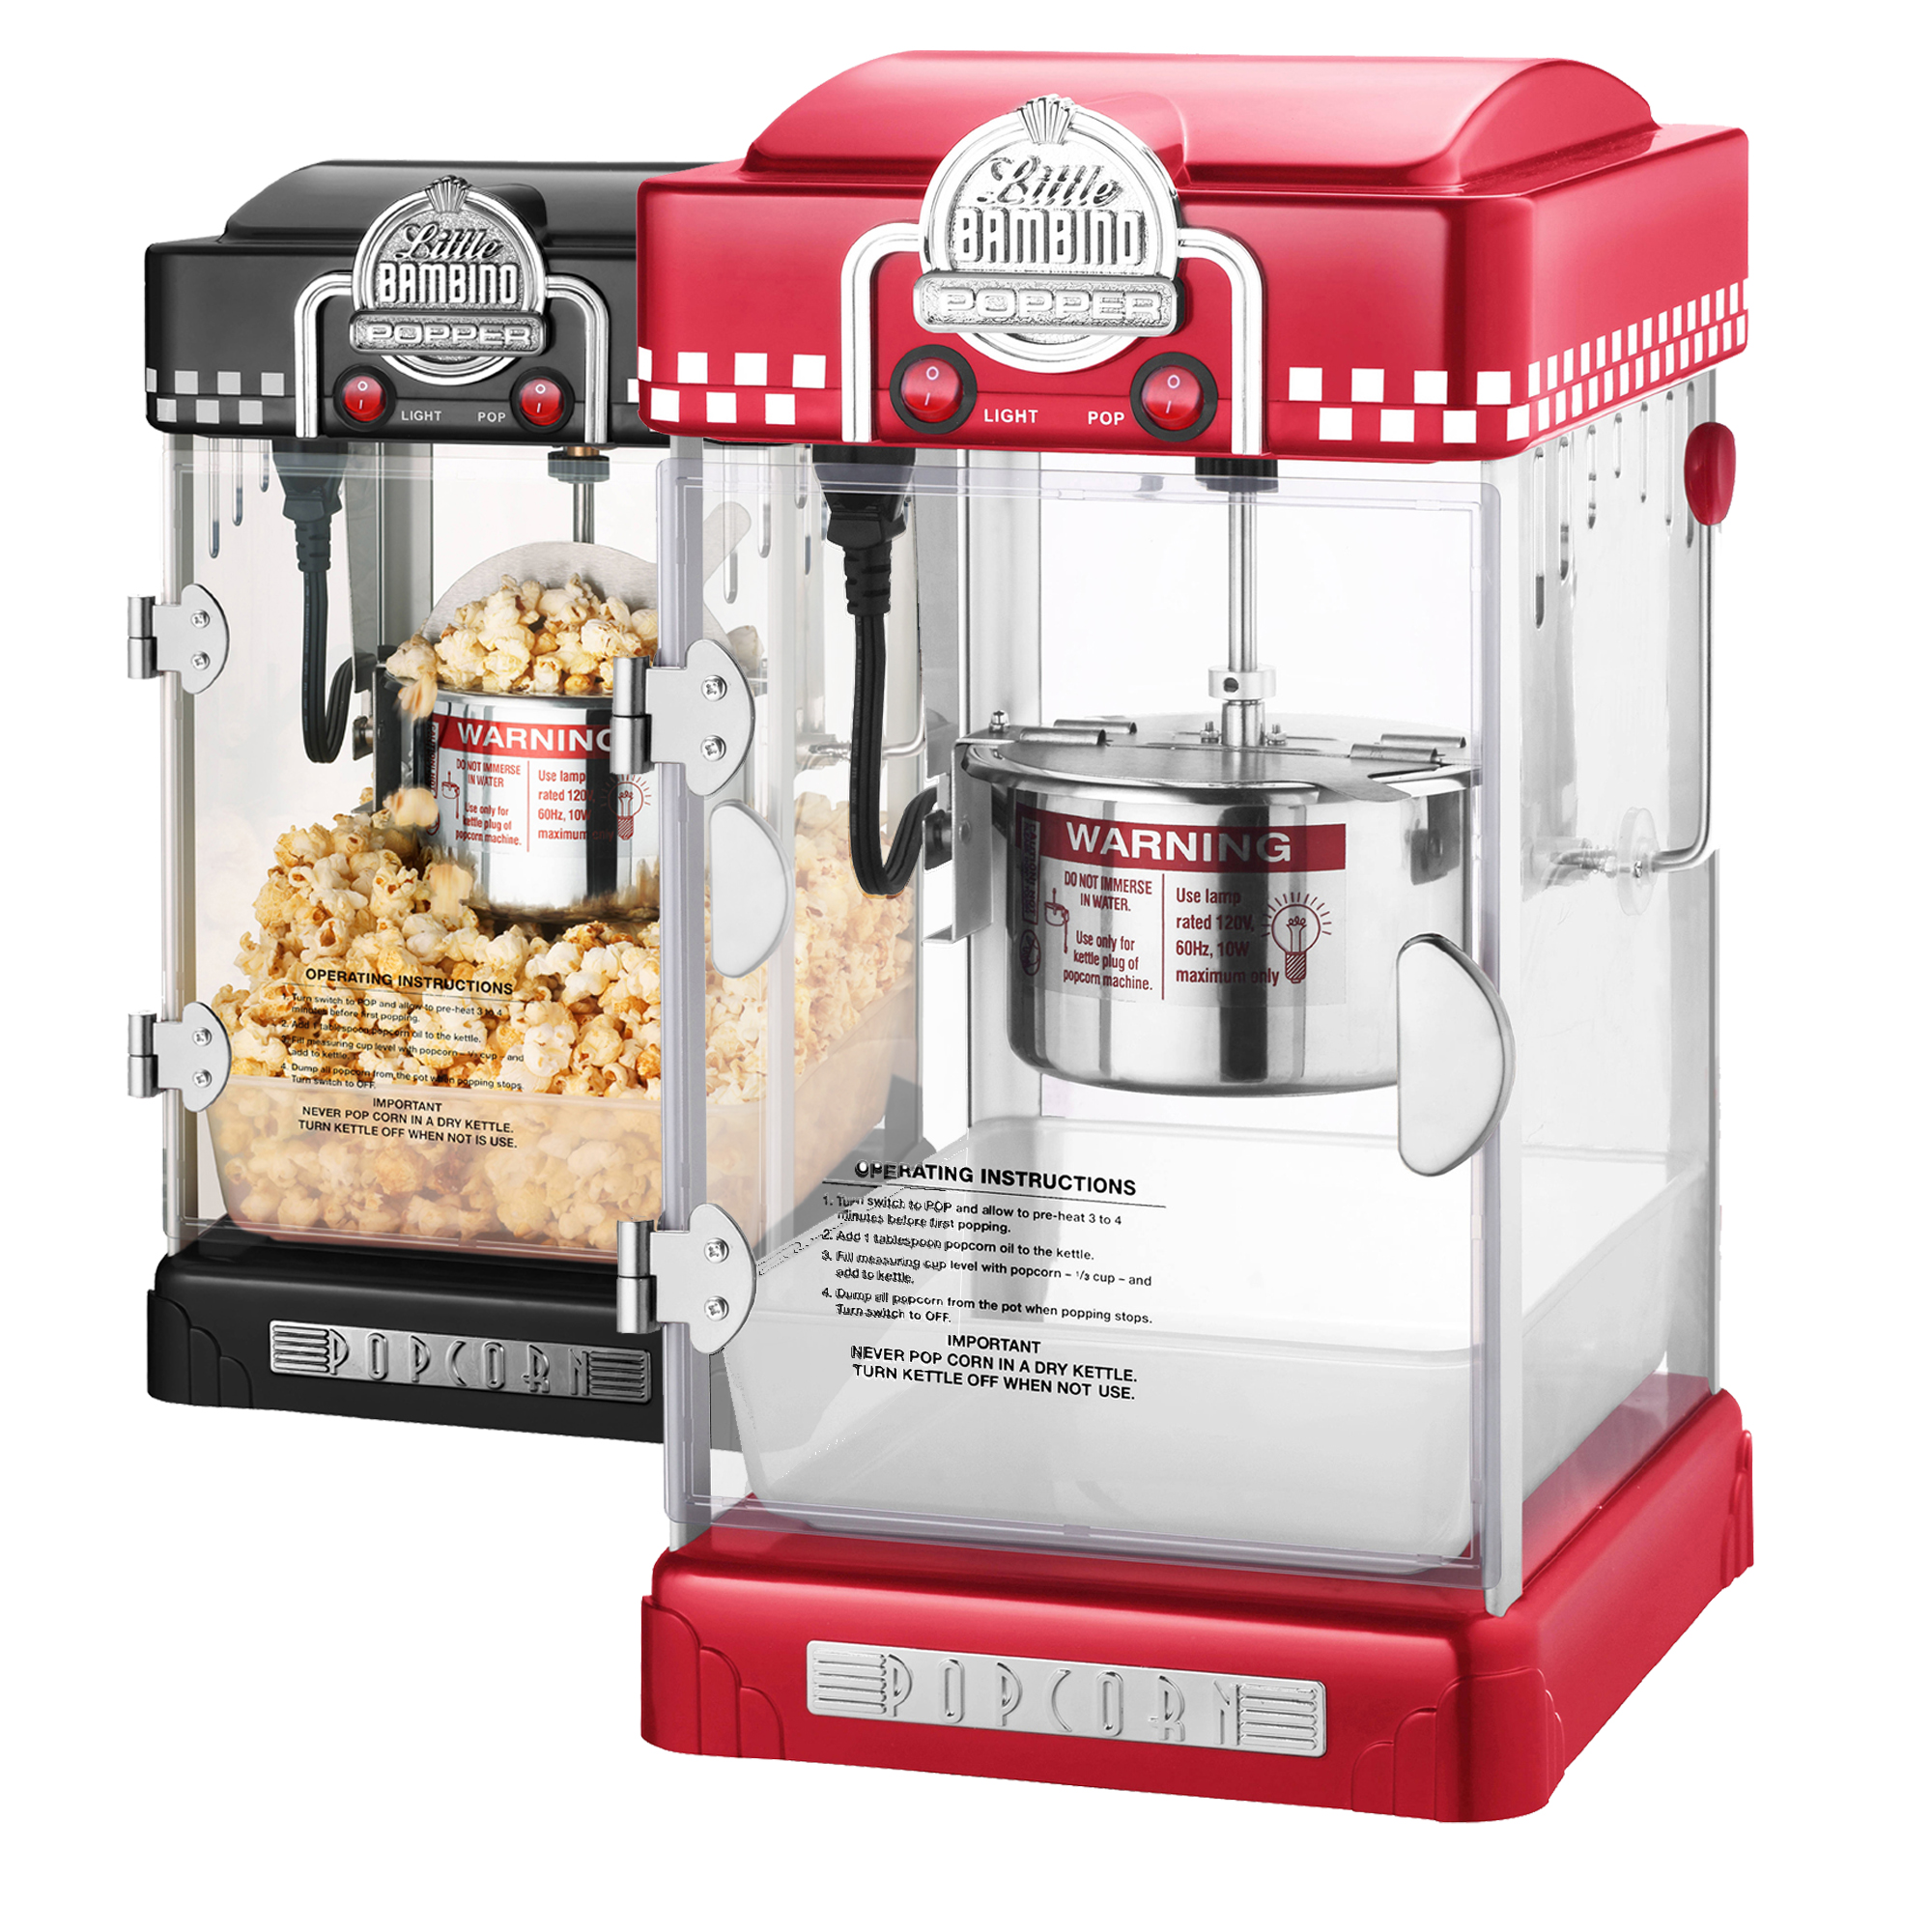 little bambino retro 2 5 oz tabletop kettle popcorn popper. Black Bedroom Furniture Sets. Home Design Ideas